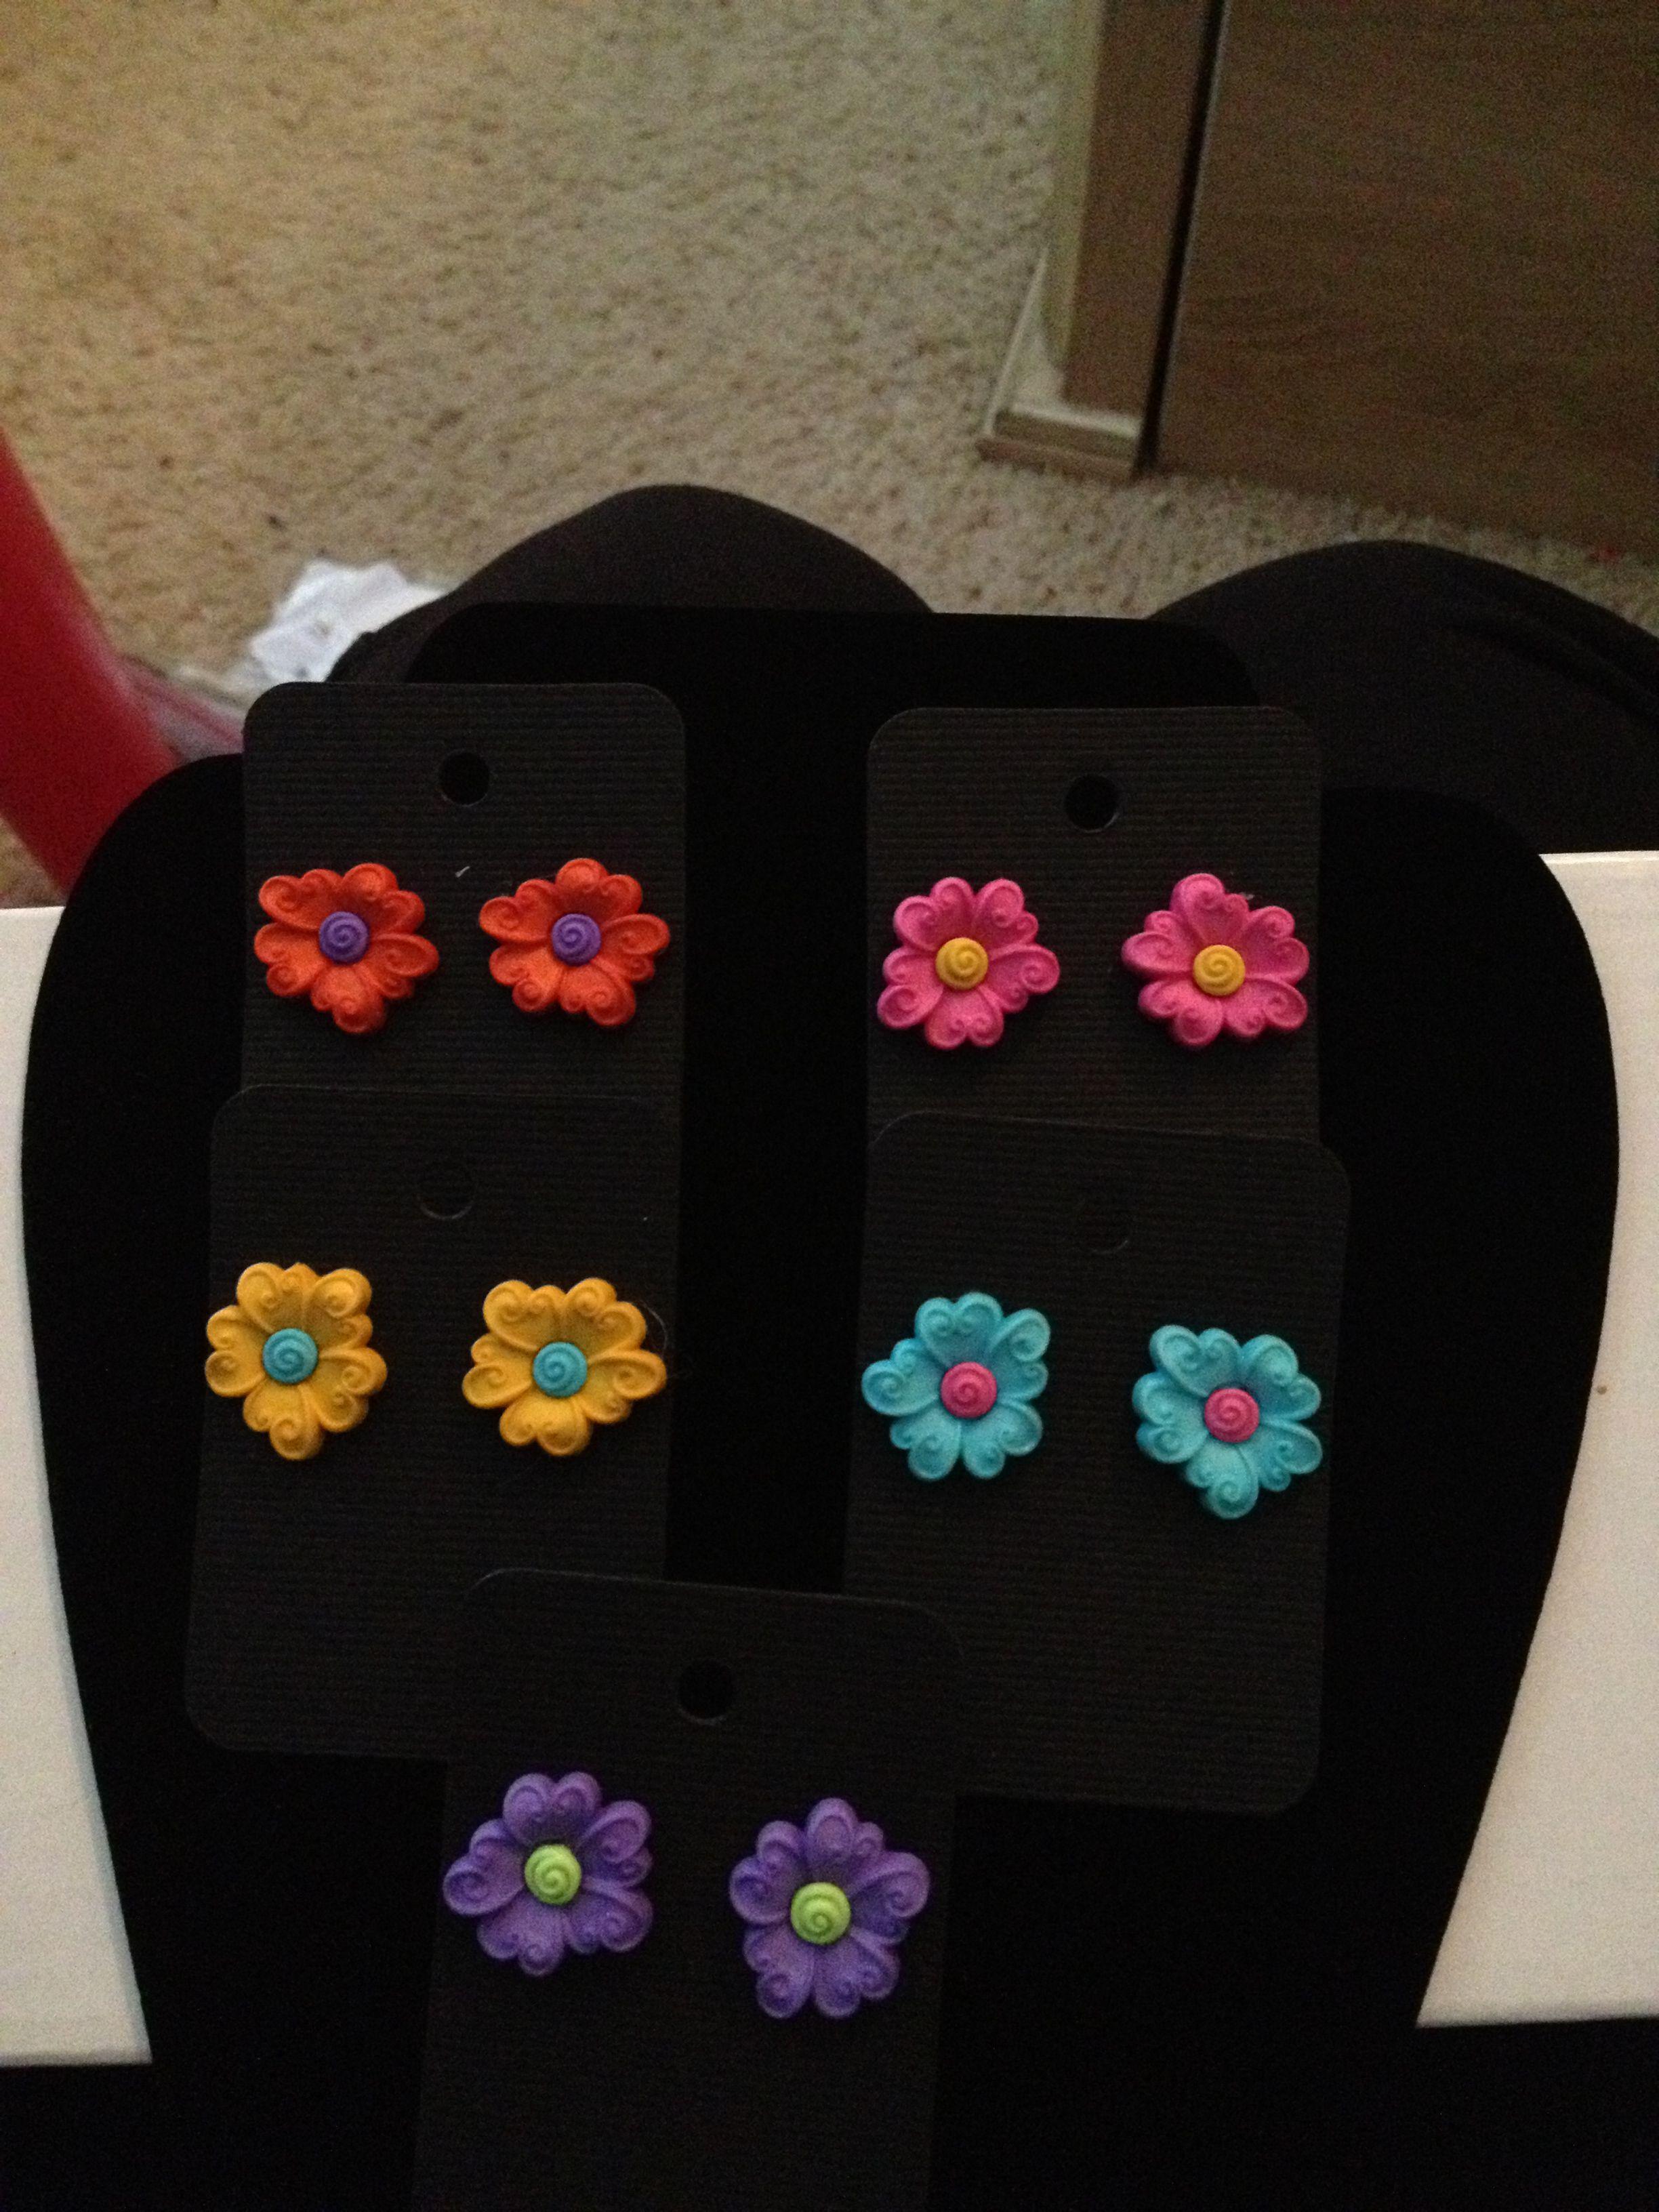 Custom Made Earrings By Me:jmg Email Me @ Jmgdesigner2@yahoo